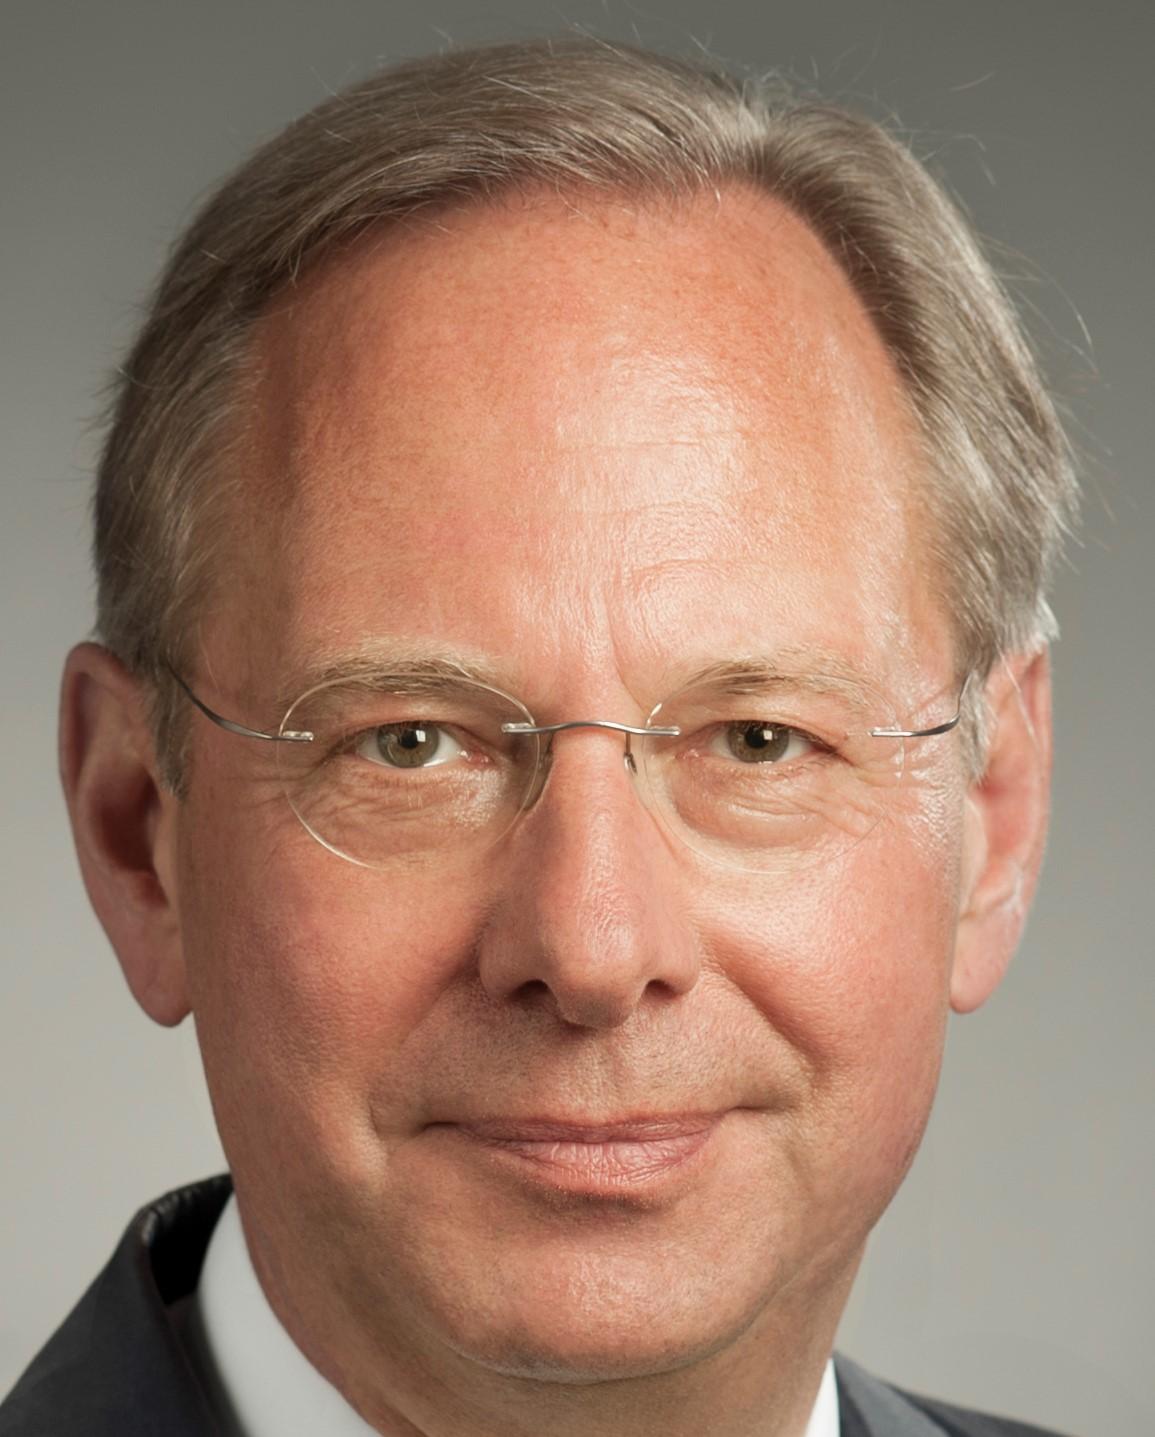 Ralf Mock